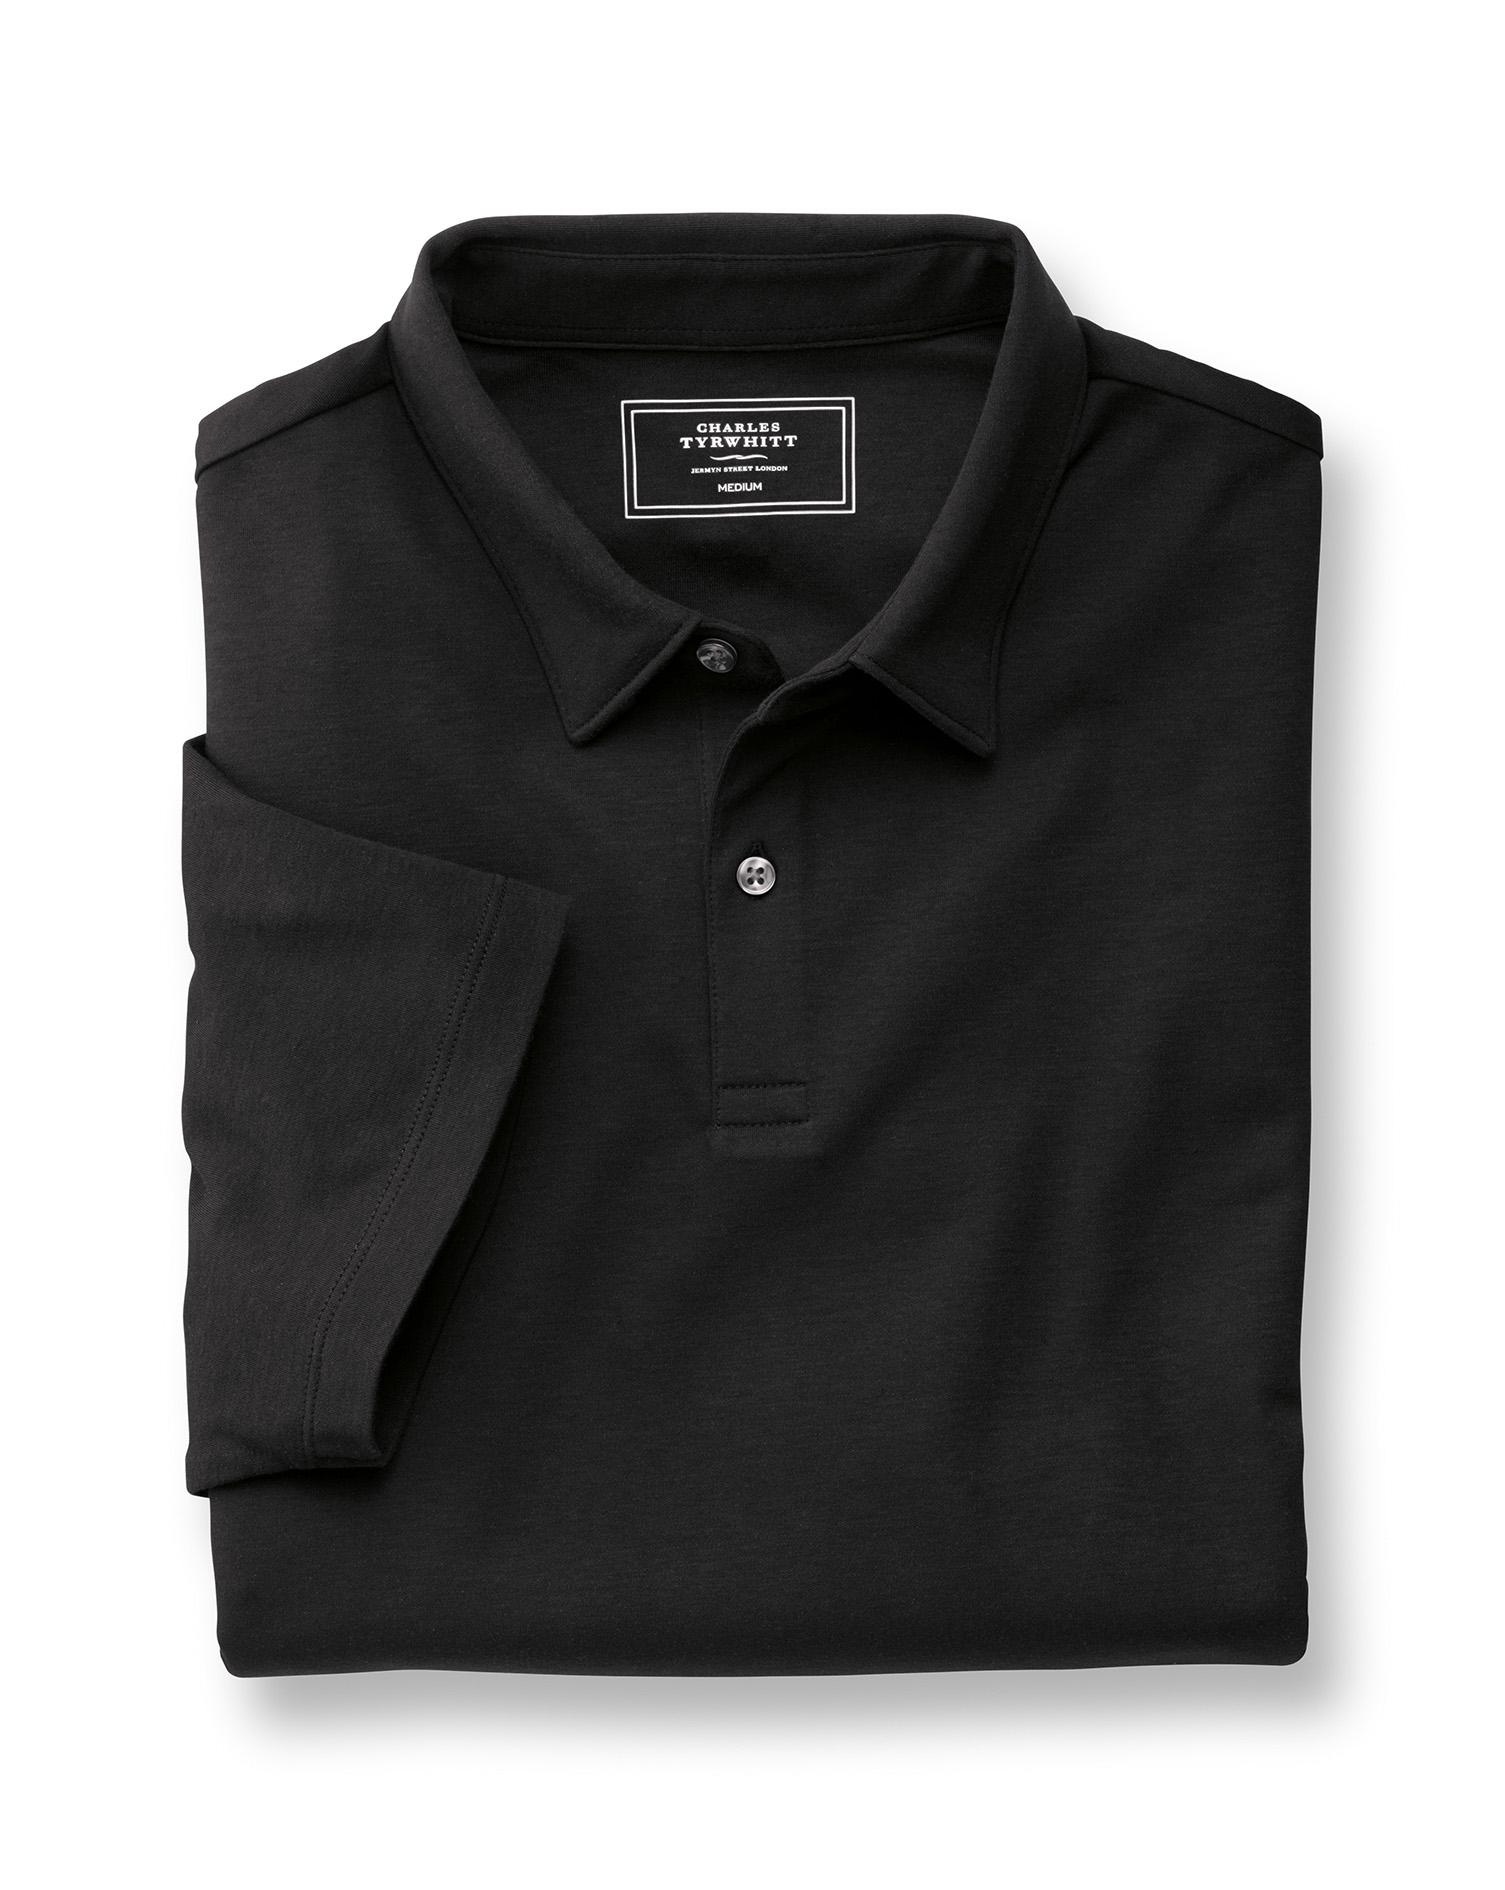 Plain Black Jersey Cotton Polo Size XXXL by Charles Tyrwhitt